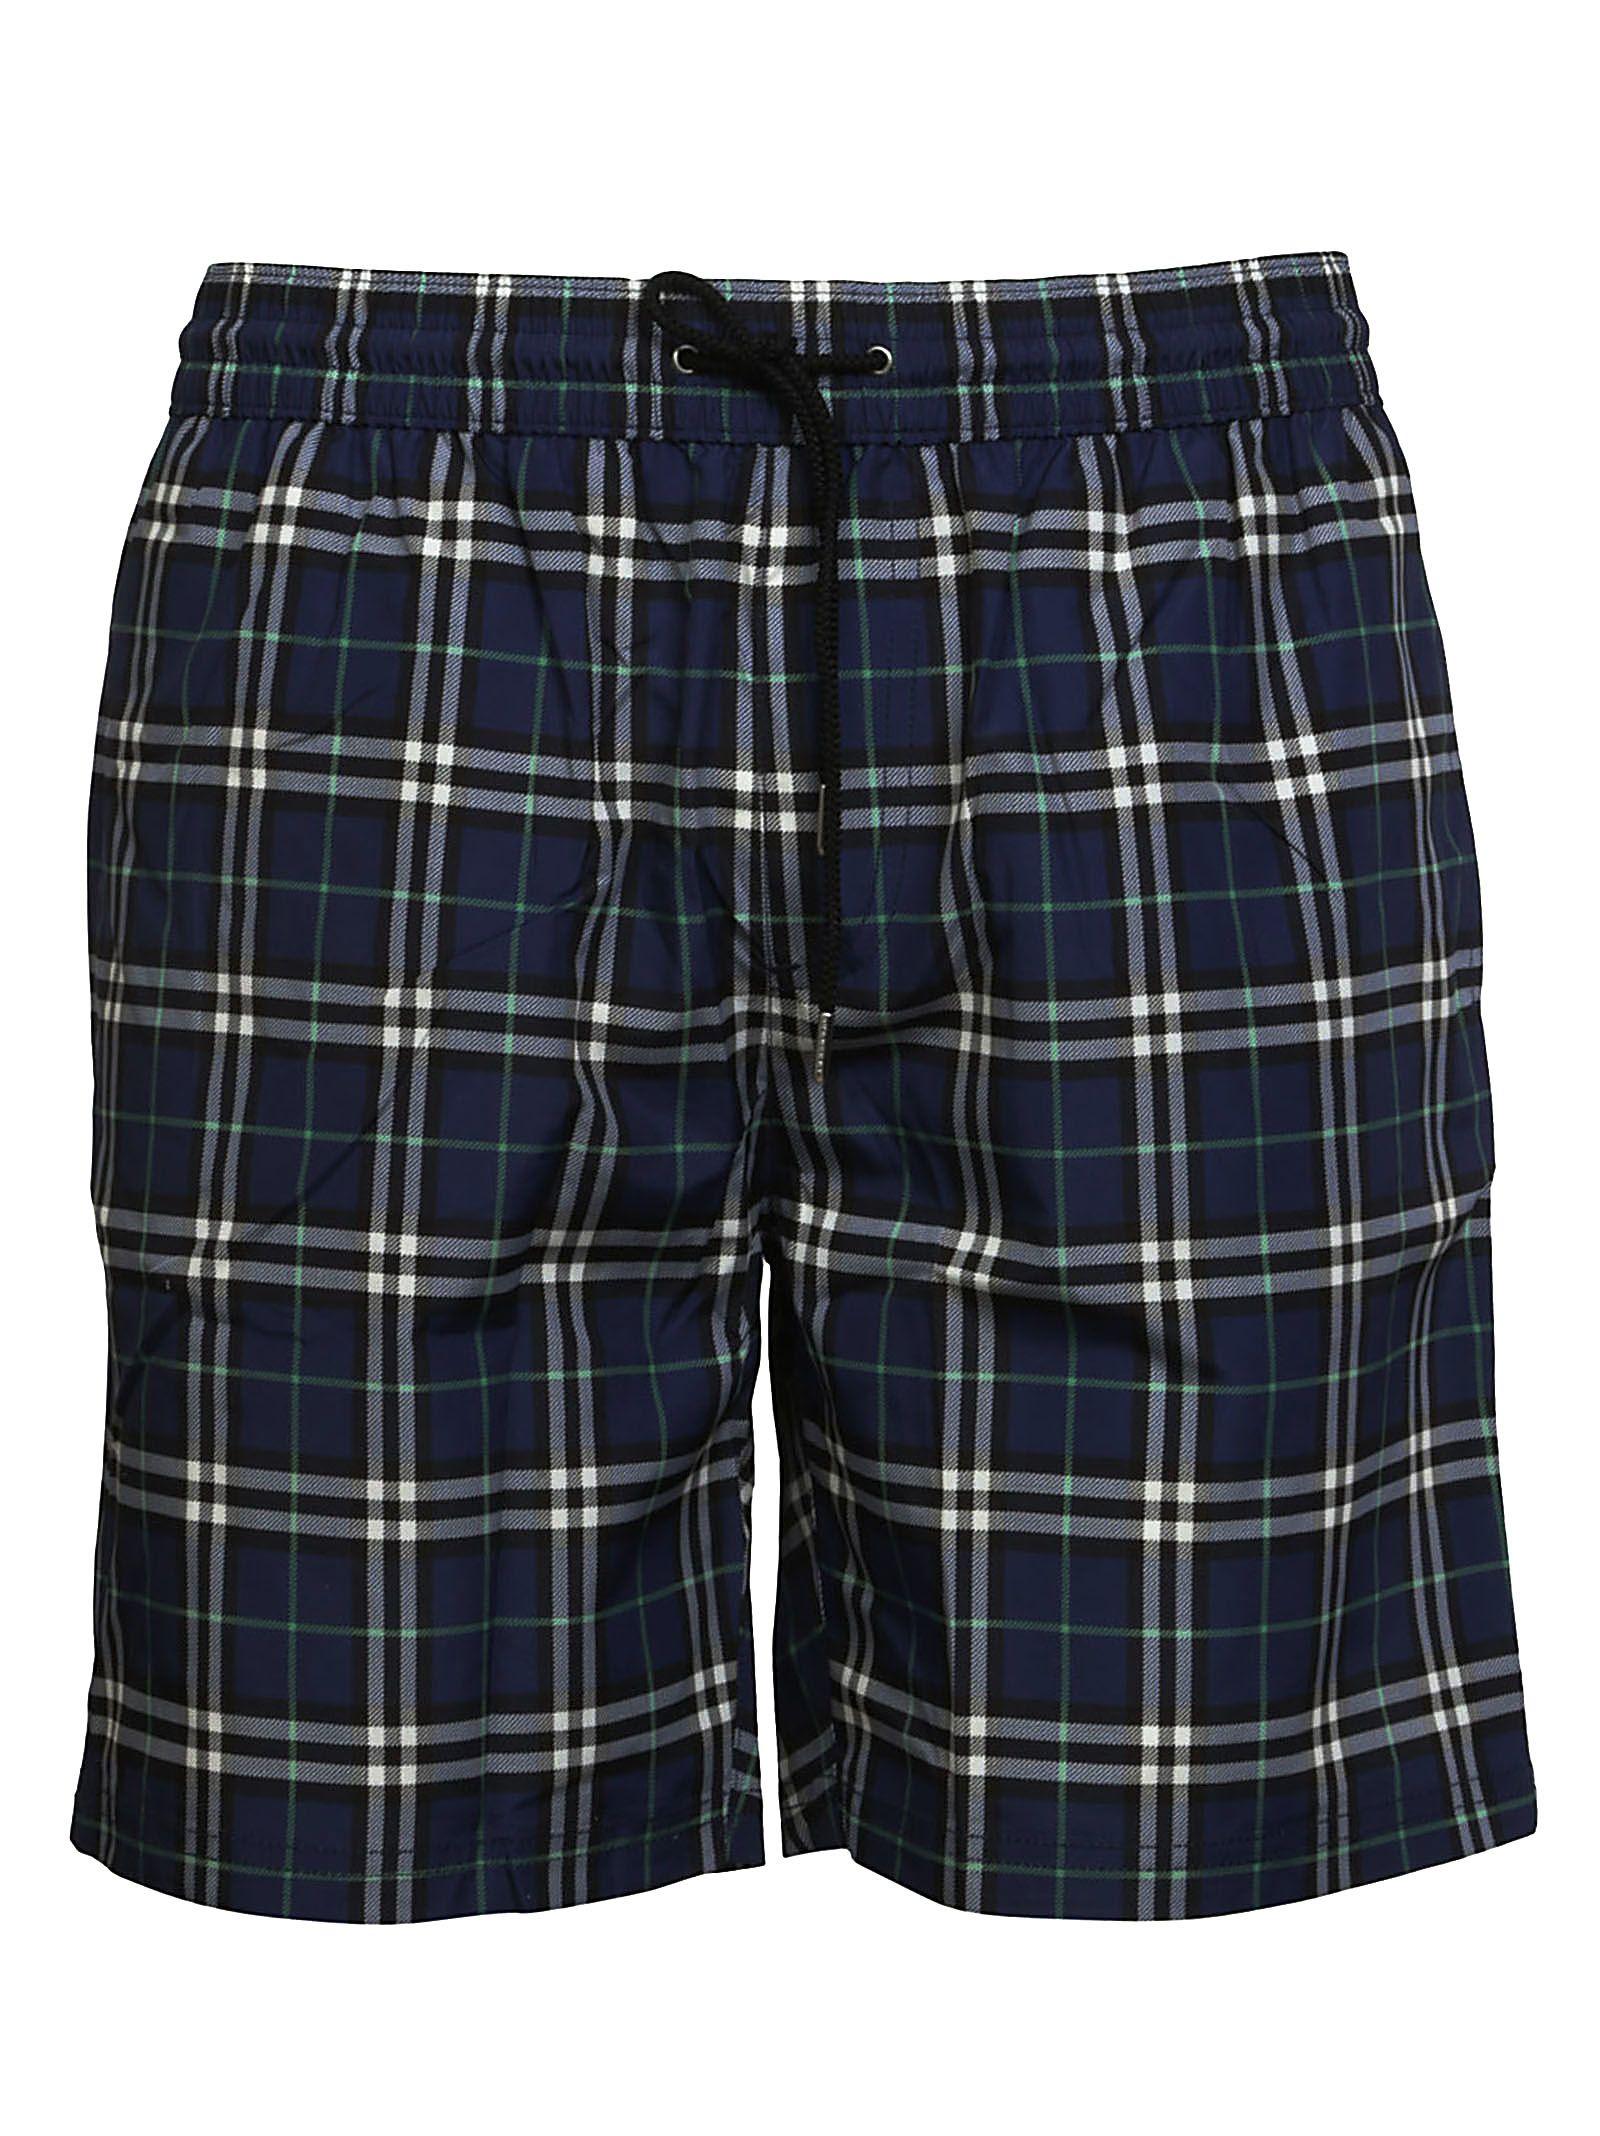 4a01867627 Burberry Burberry Check Guildes Swim Shorts - Blue - 10578896 | italist